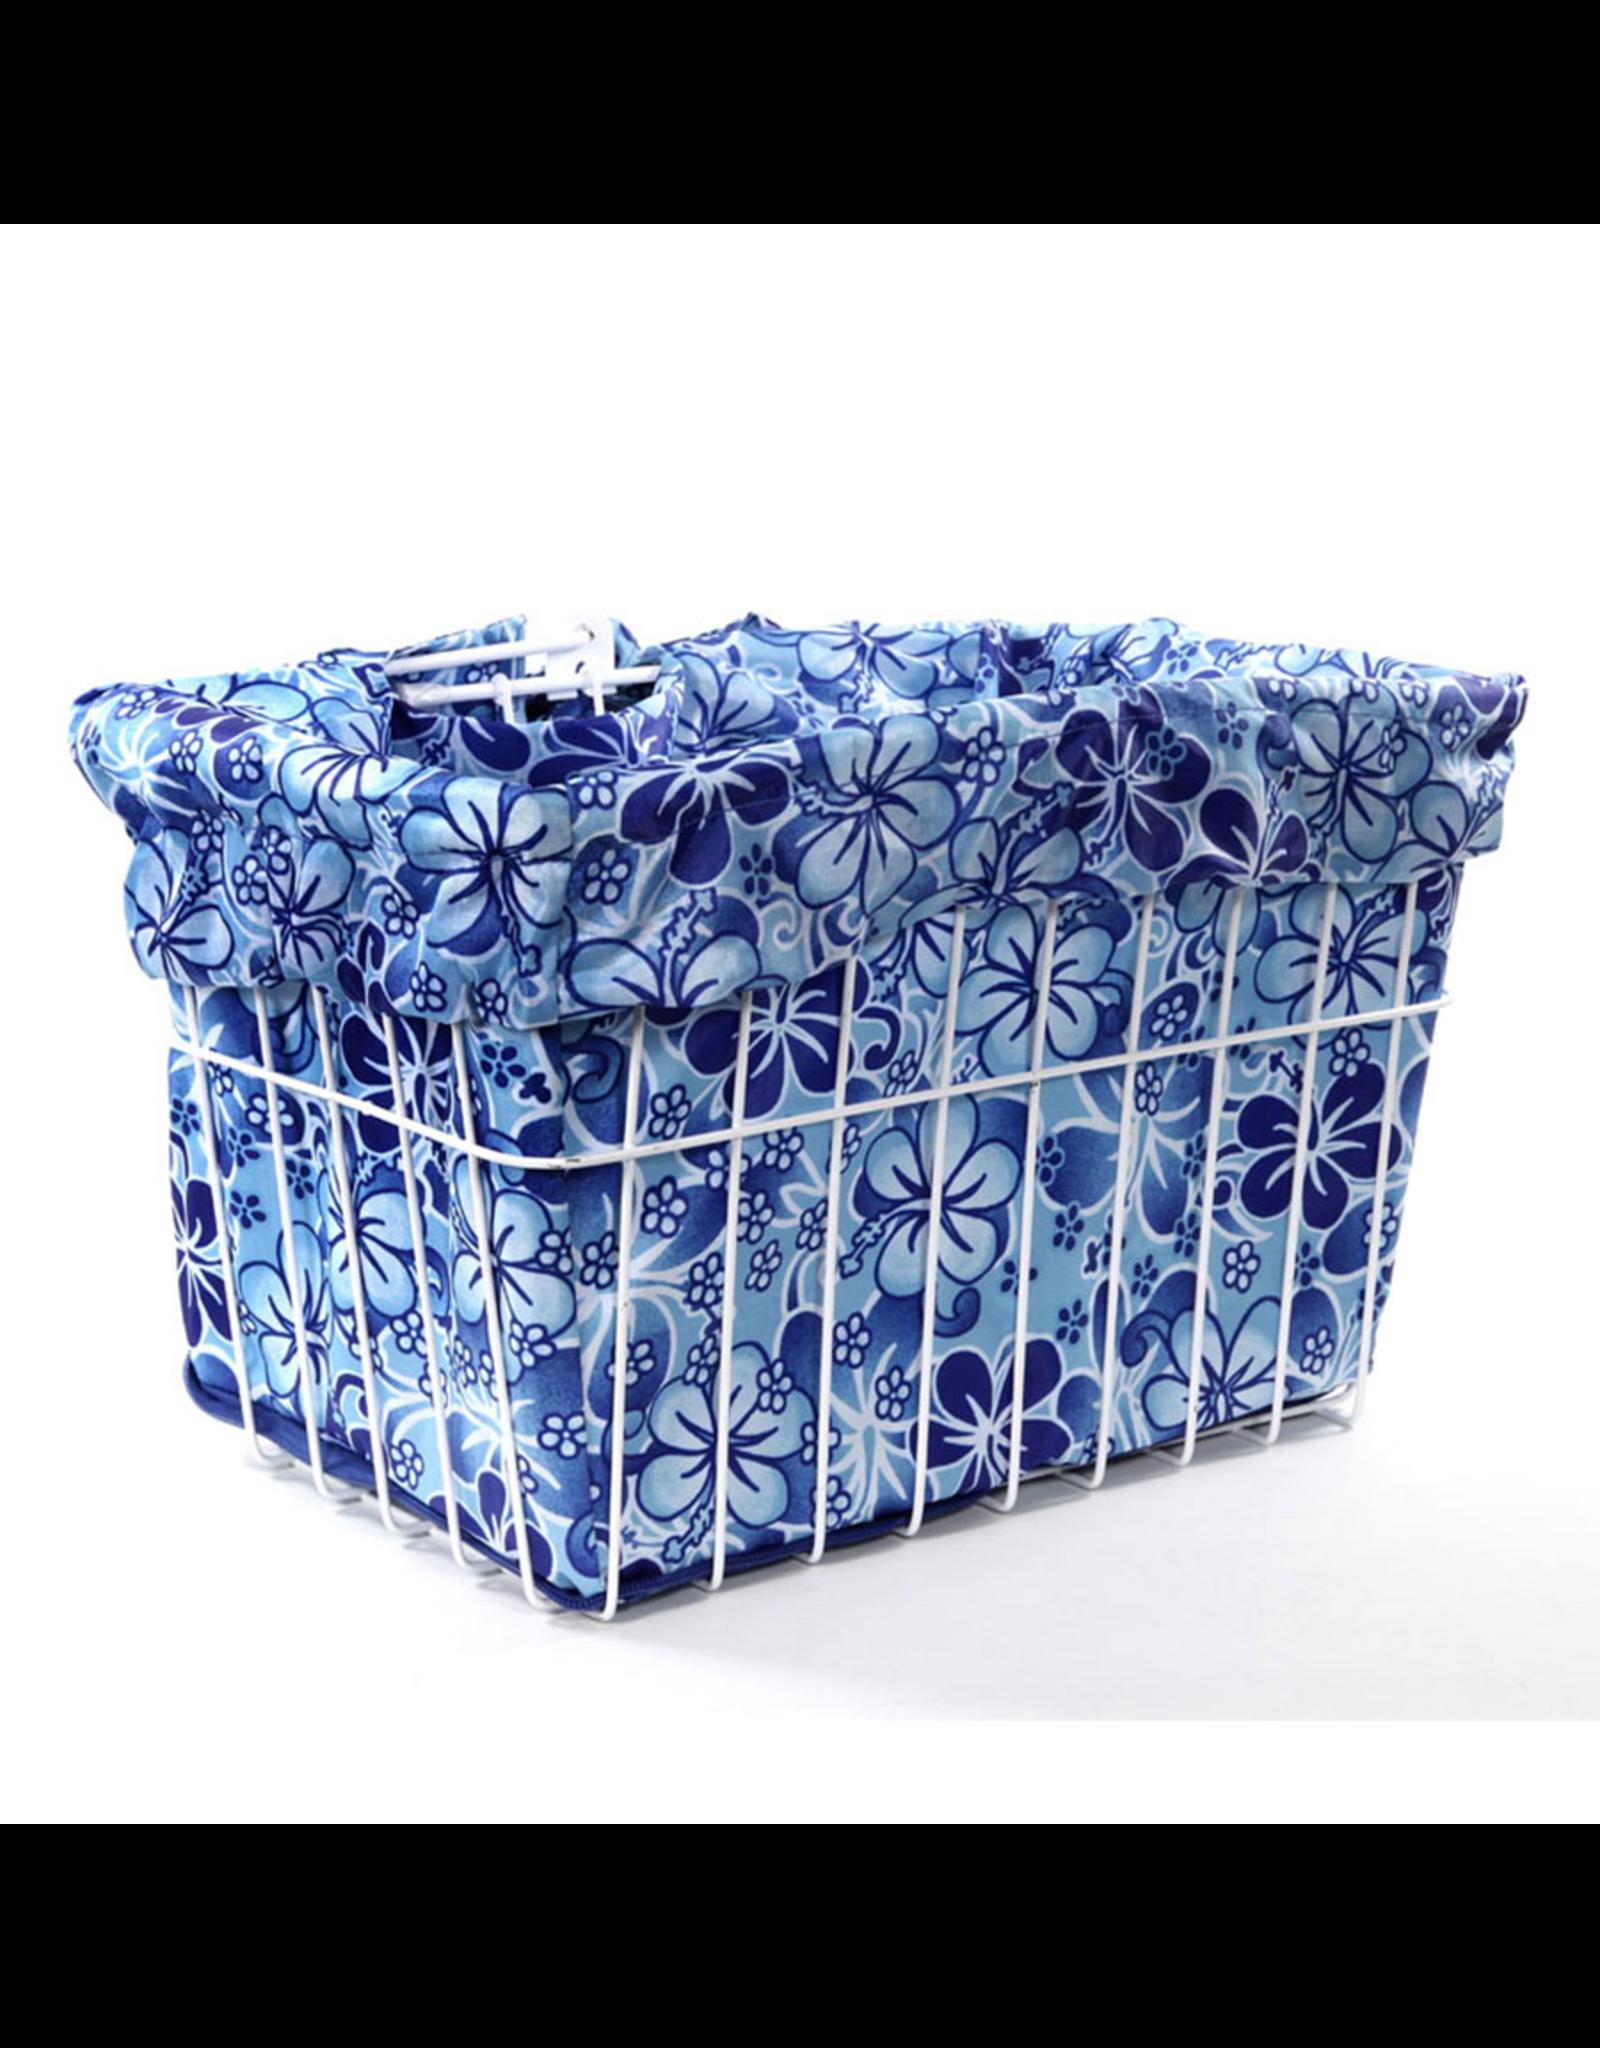 Cruiser Candy Cruiser Candy Basket Liner - Blue Hawaiian